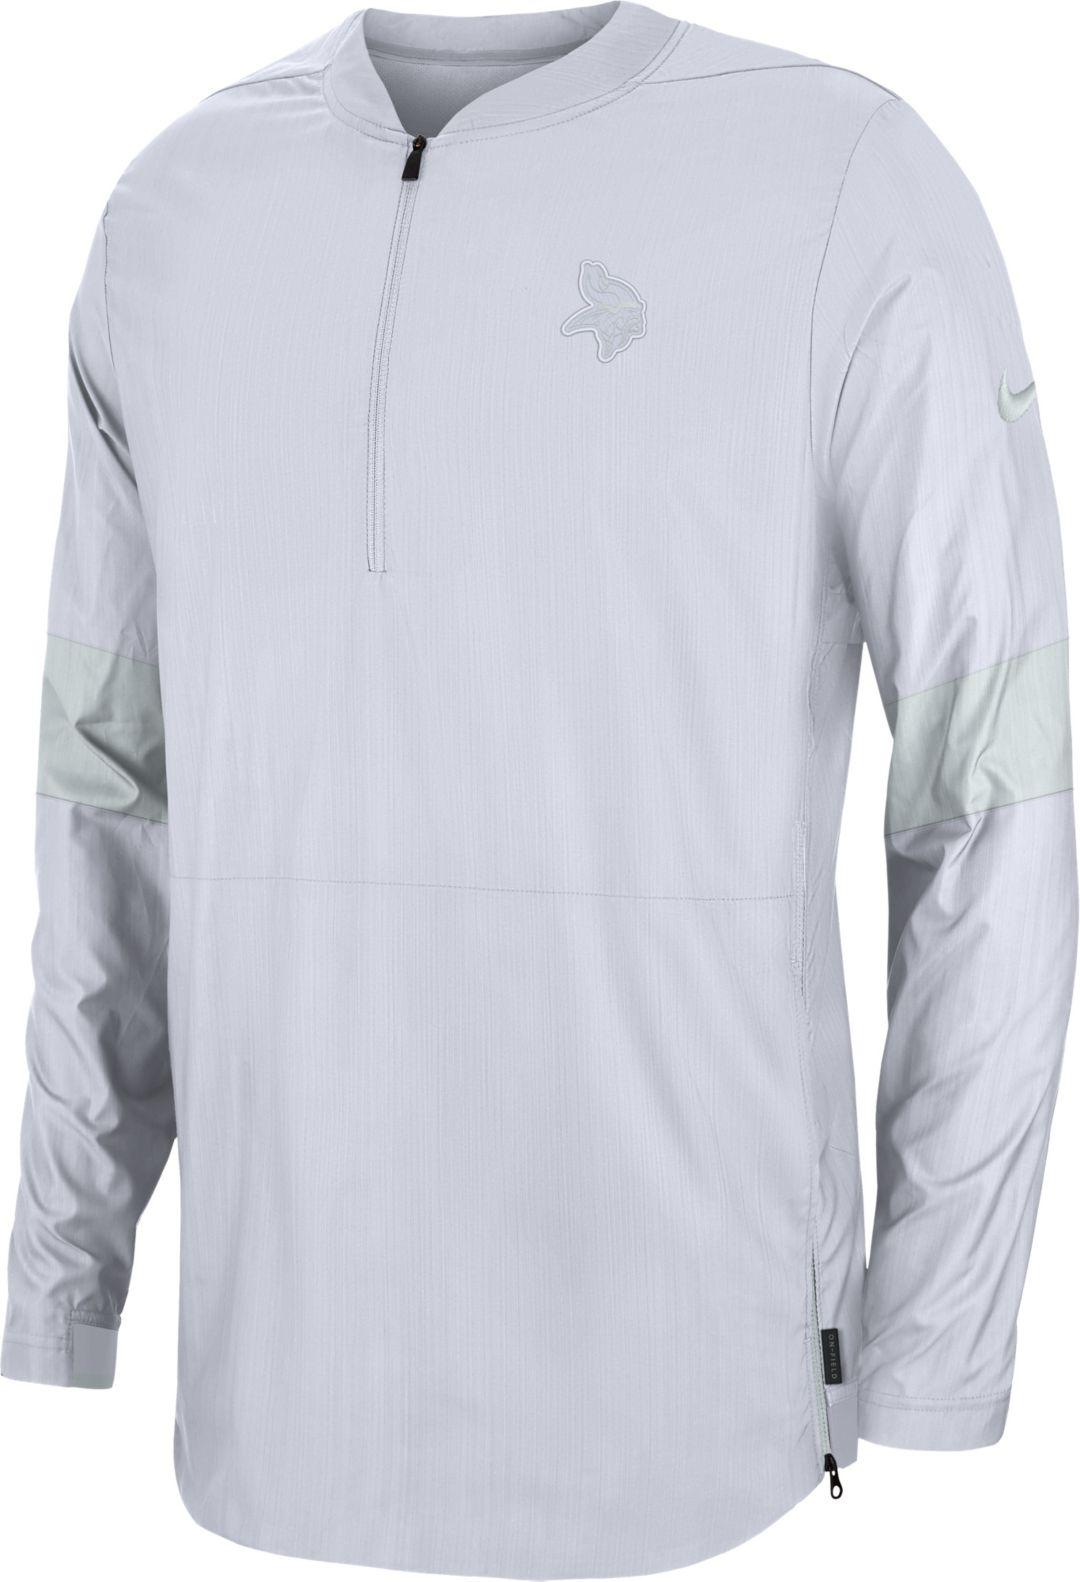 factory price 0a19e f5504 Nike Men's Minnesota Vikings Sideline Coach White Half-Zip Performance  Jacket